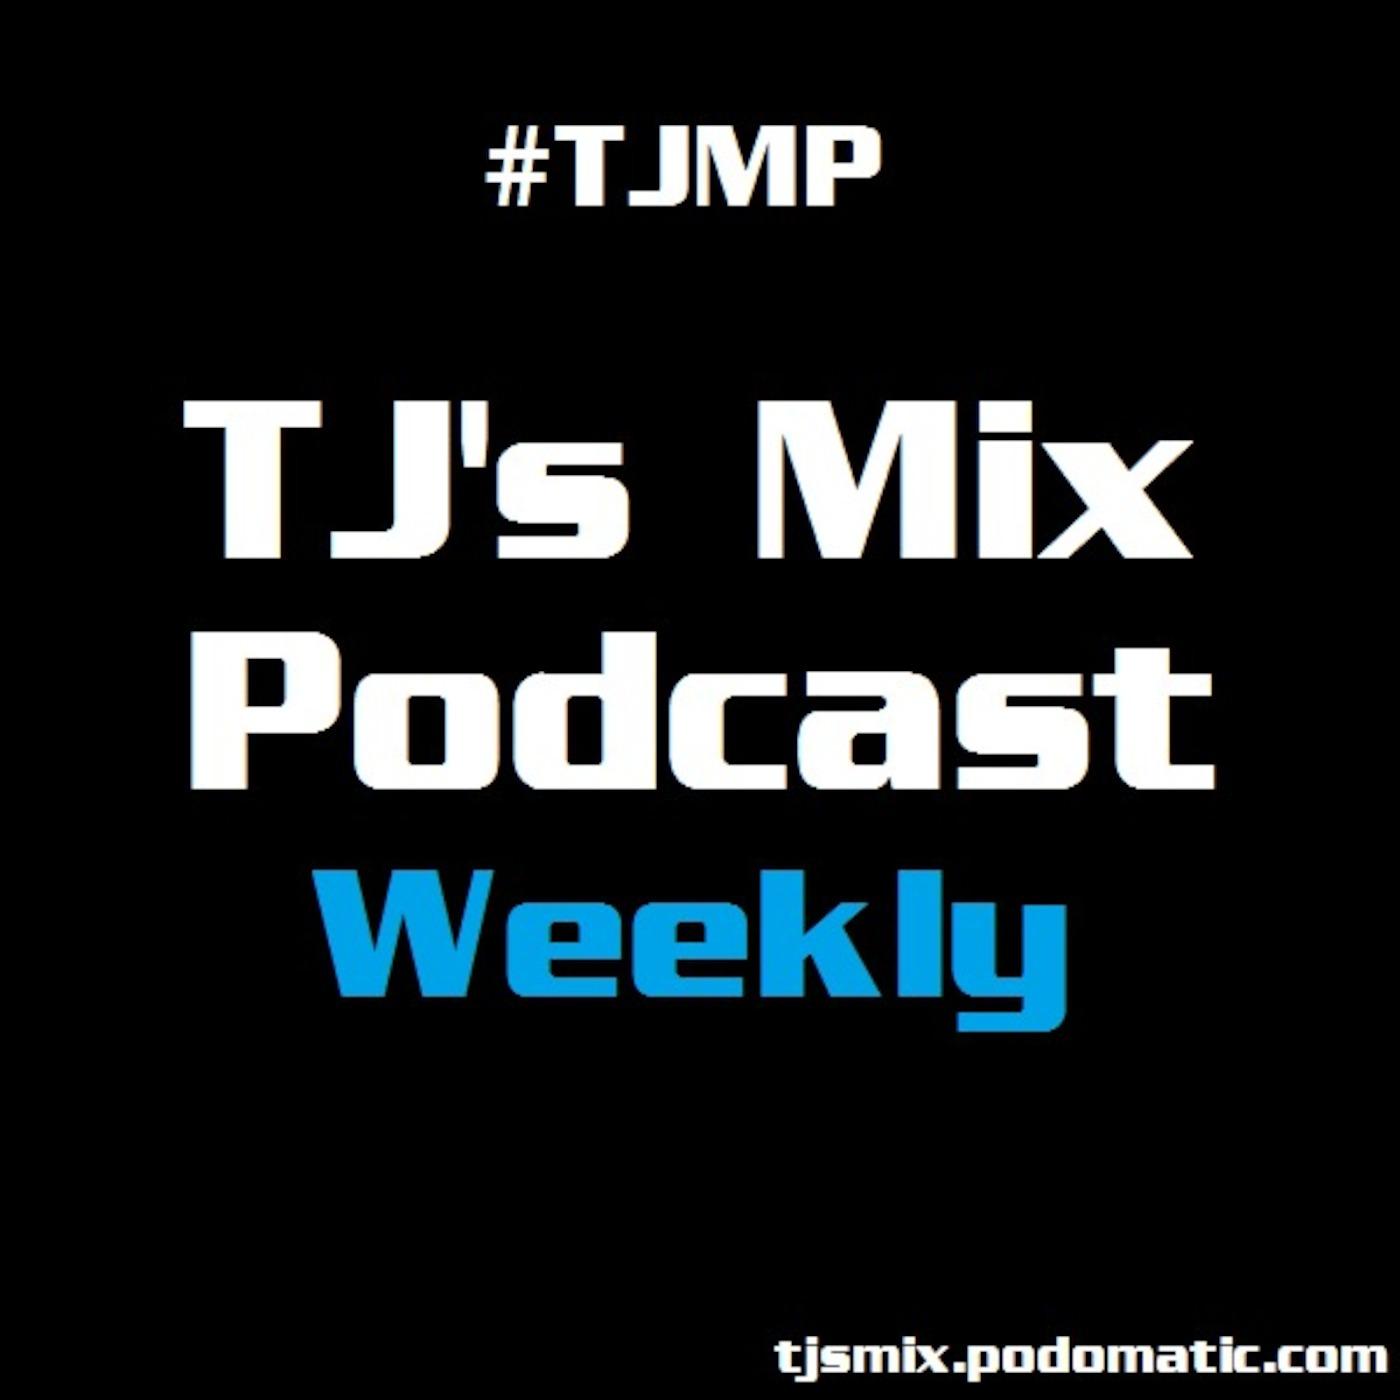 TJ's Mix Podcast